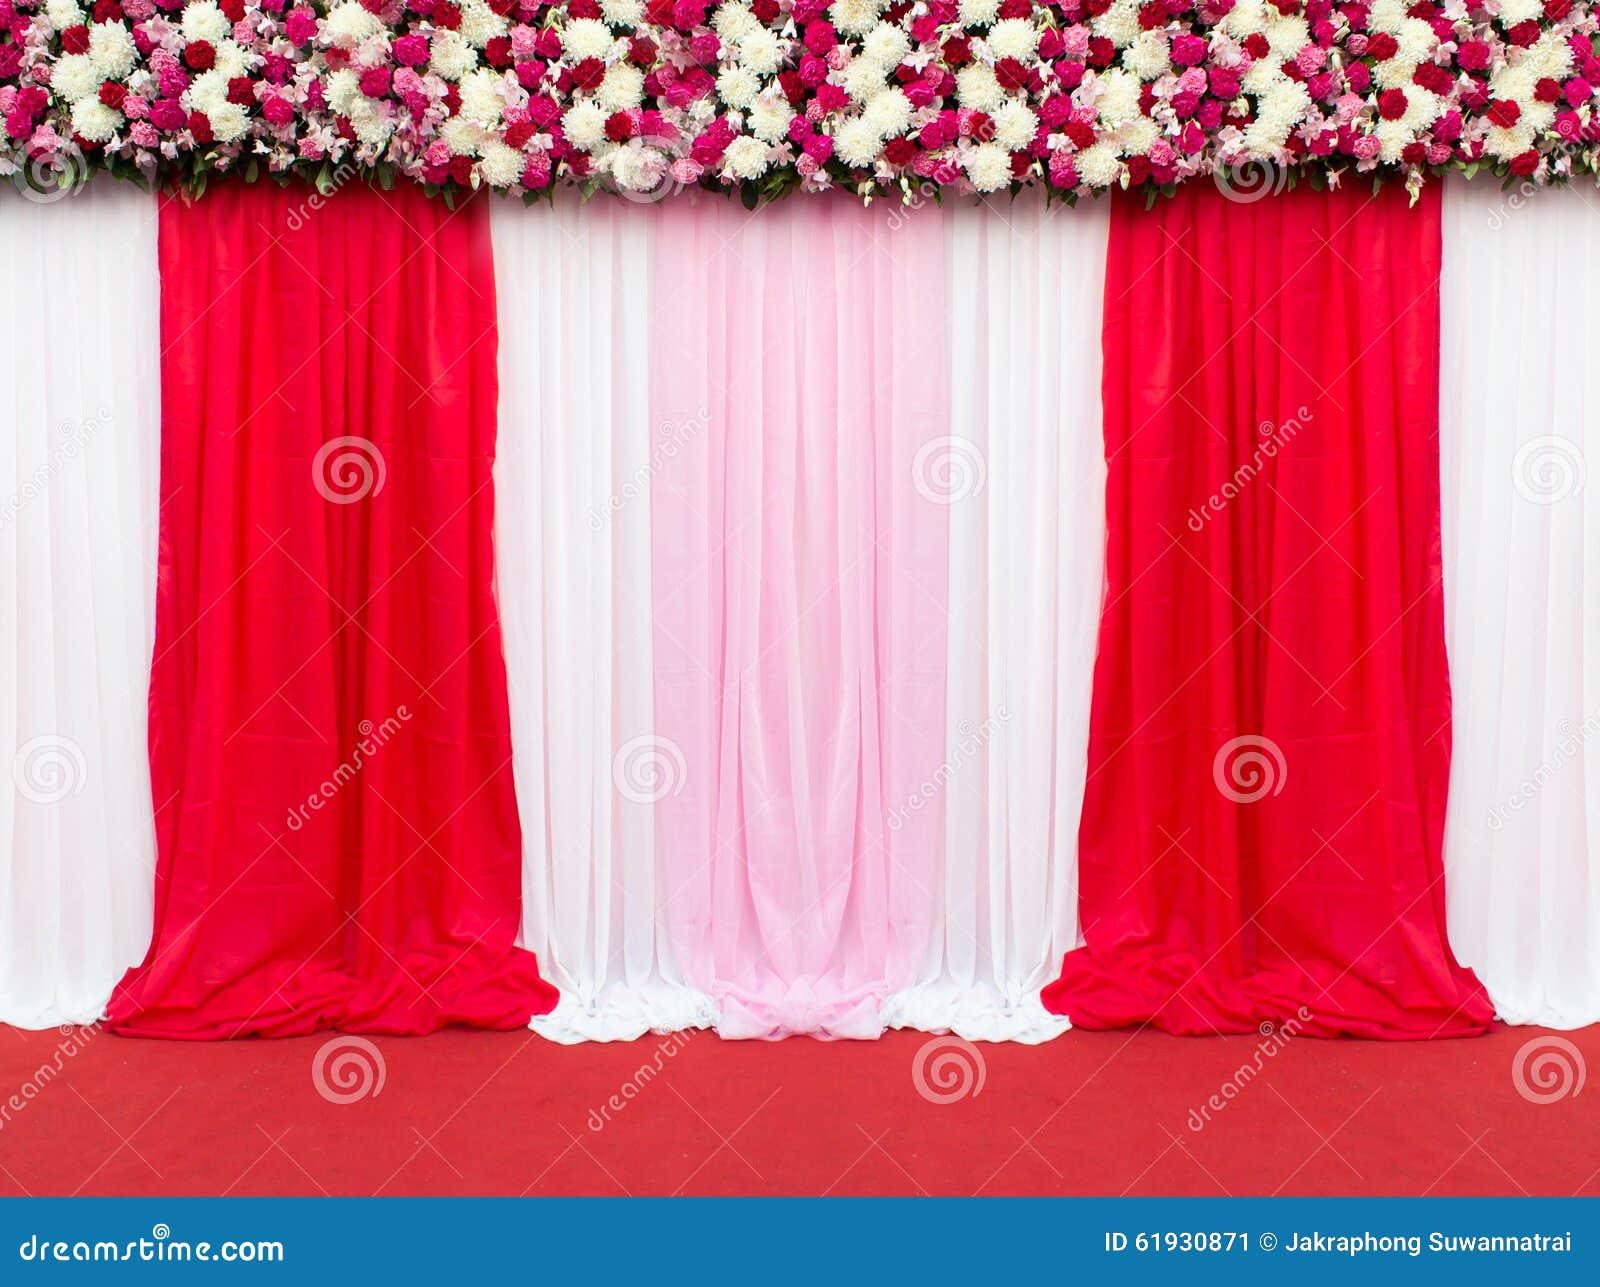 Wedding stage decoration stock images 1140 photos wedding stage decoration for take picture stock image altavistaventures Image collections